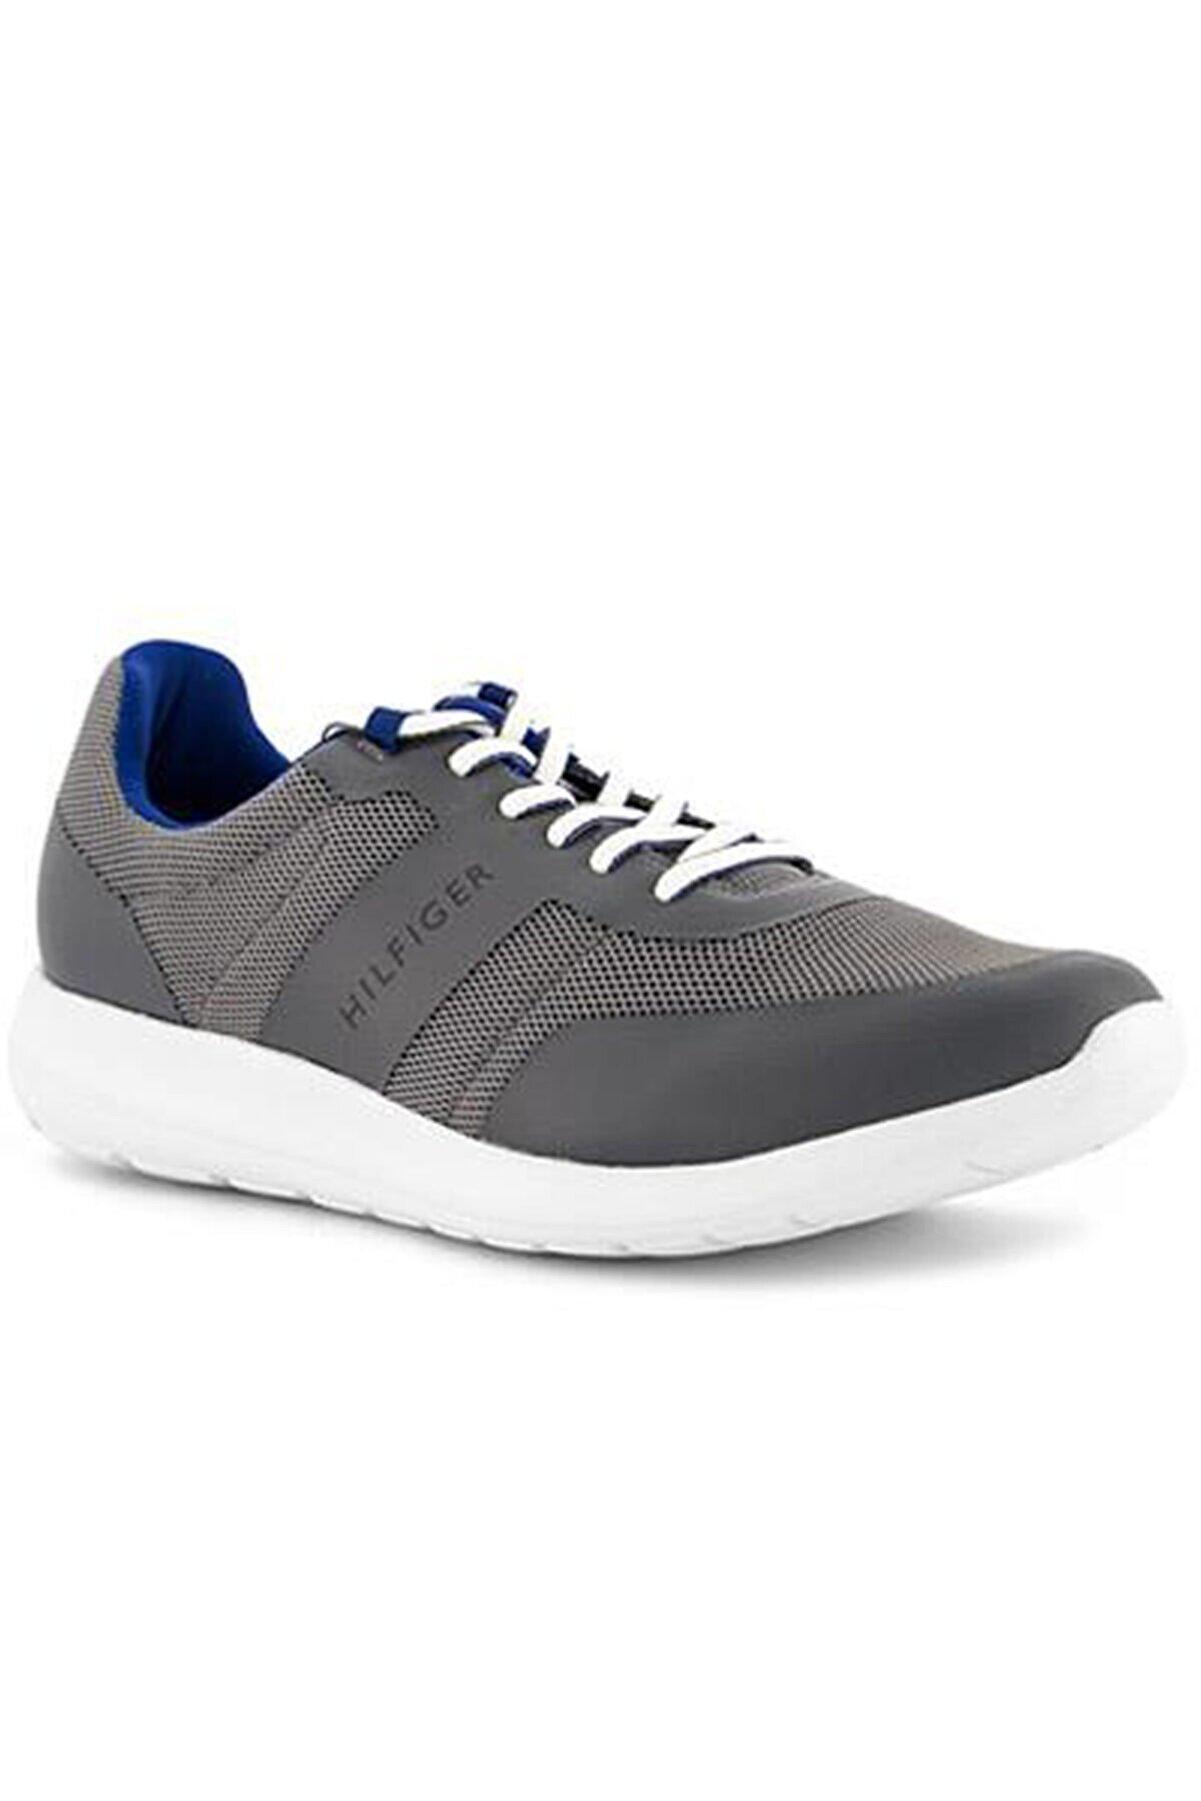 Tommy Hilfiger Erkek Ayakkabı Fm0fm02183 U004396